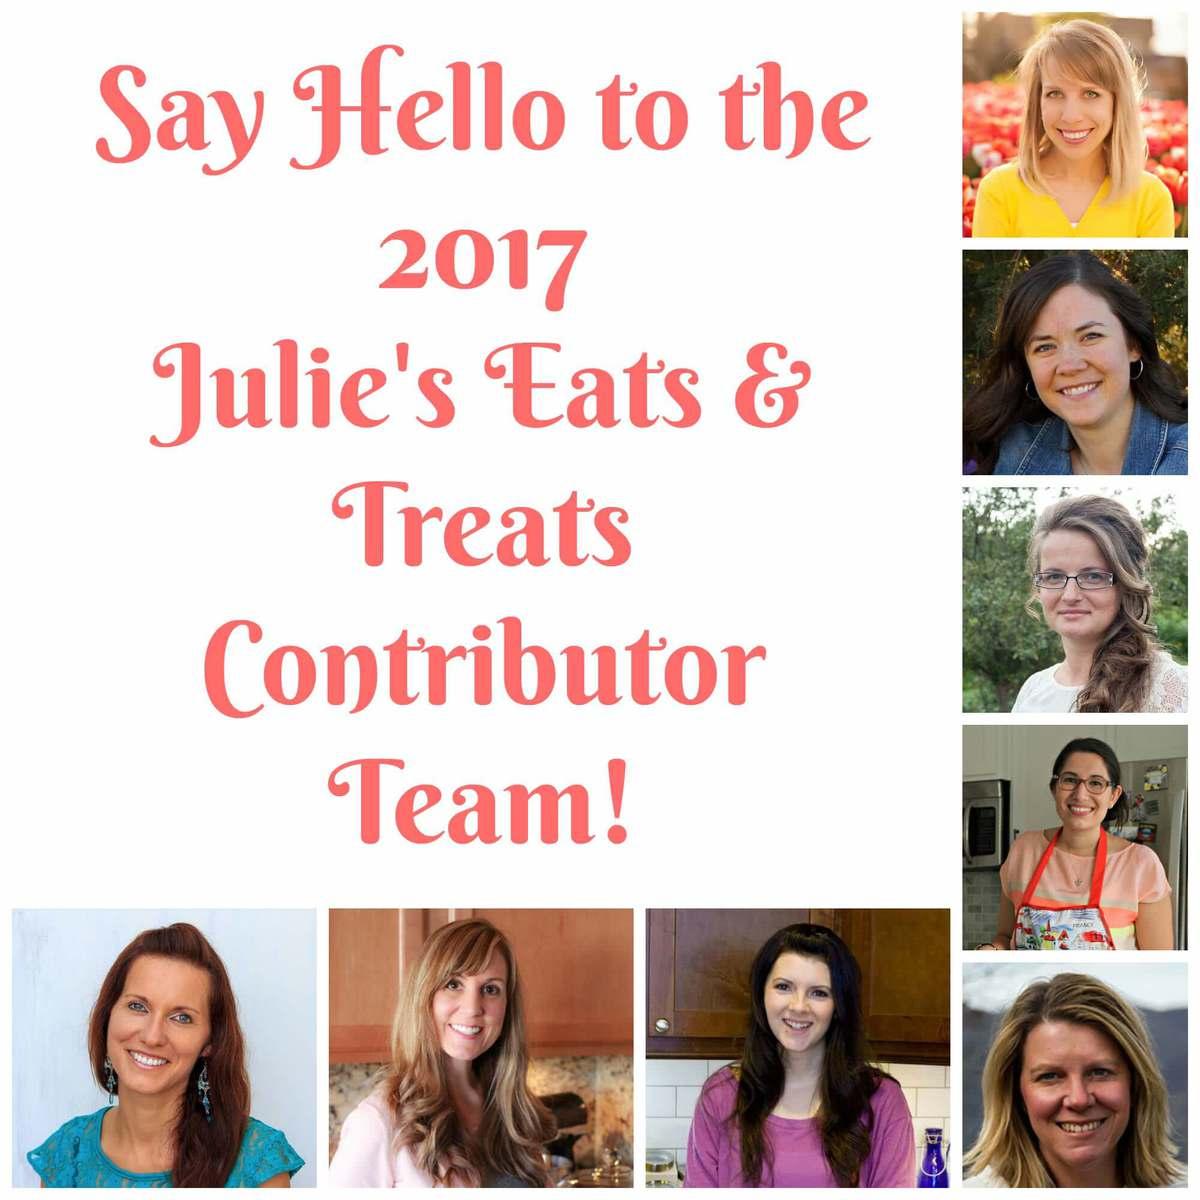 2017 Julie's Eats & Treats Contributor Team!